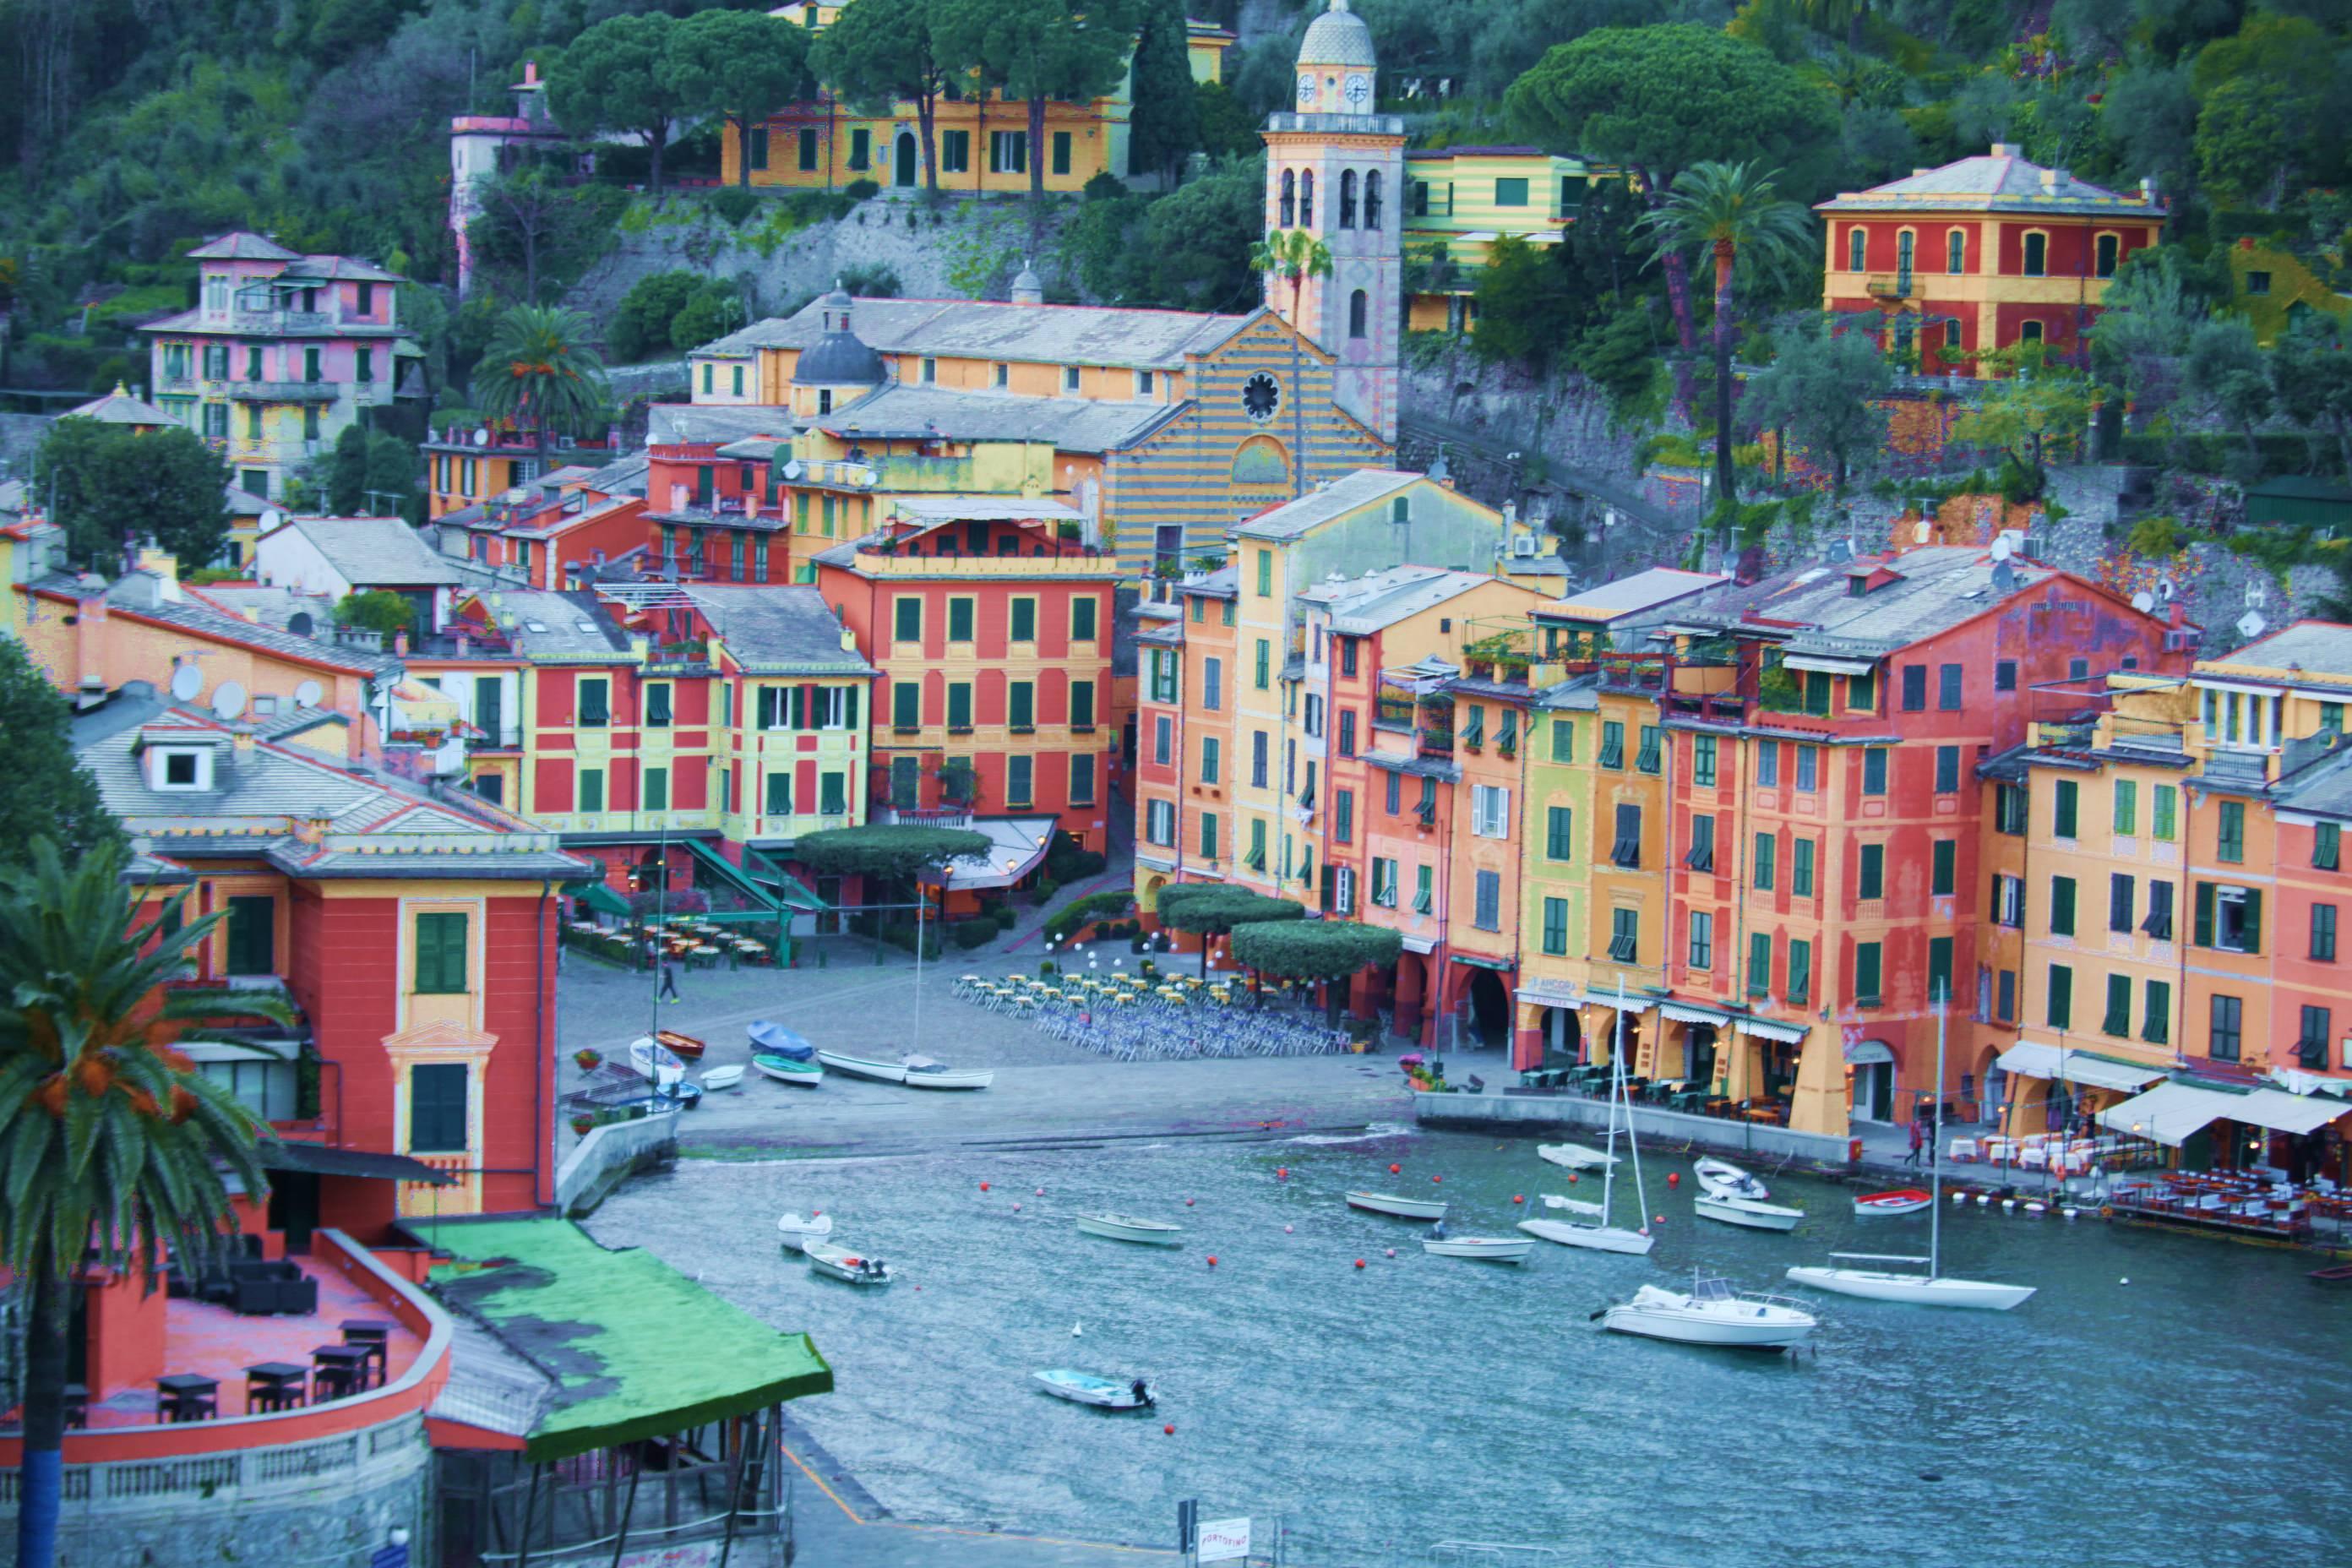 Portofino um charme italiano na costa da Ligúria – Itália